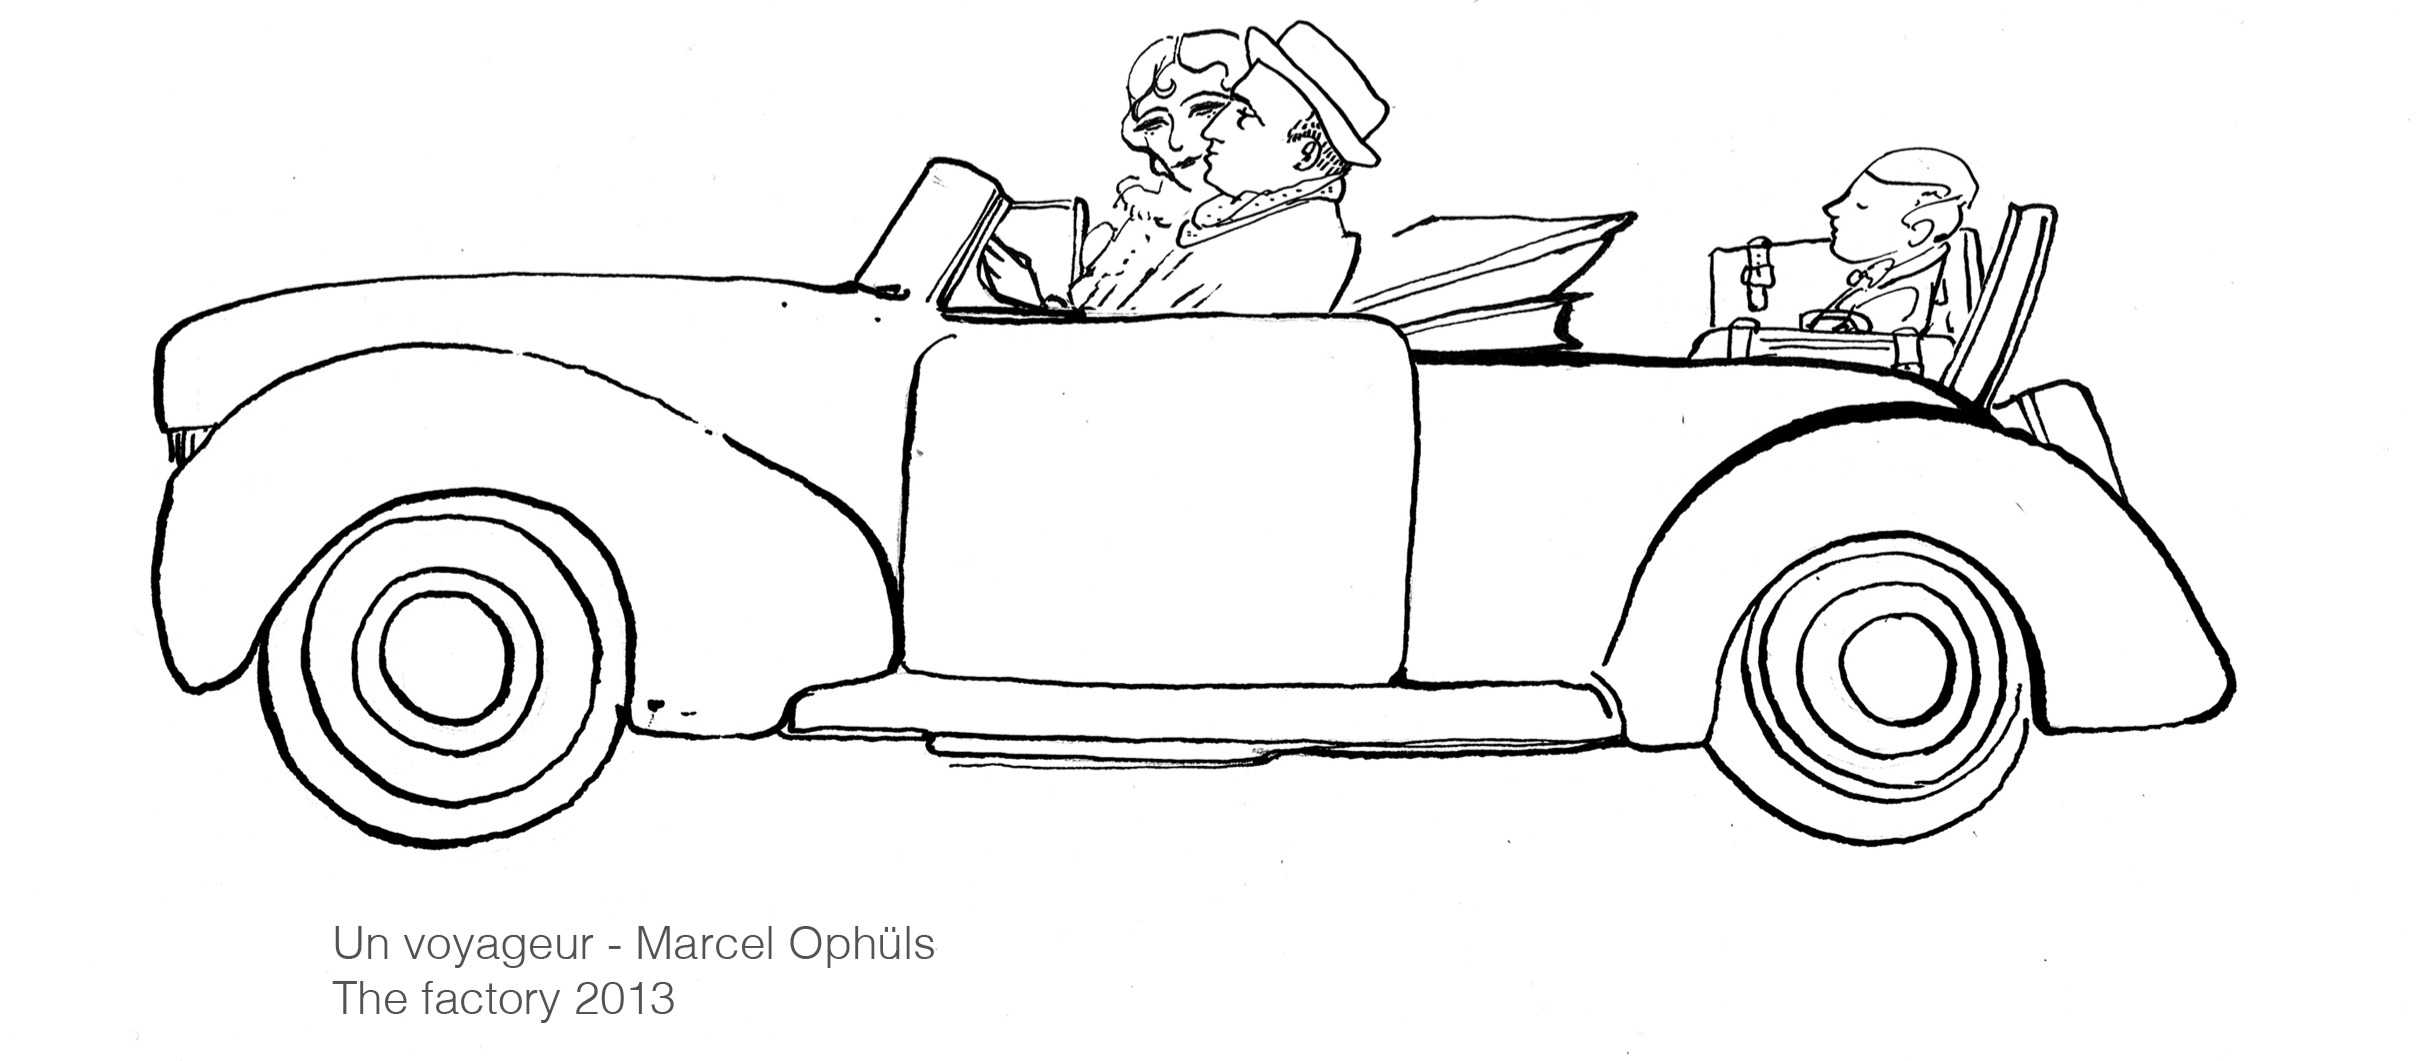 Marcel Ophüls - Un voyageur